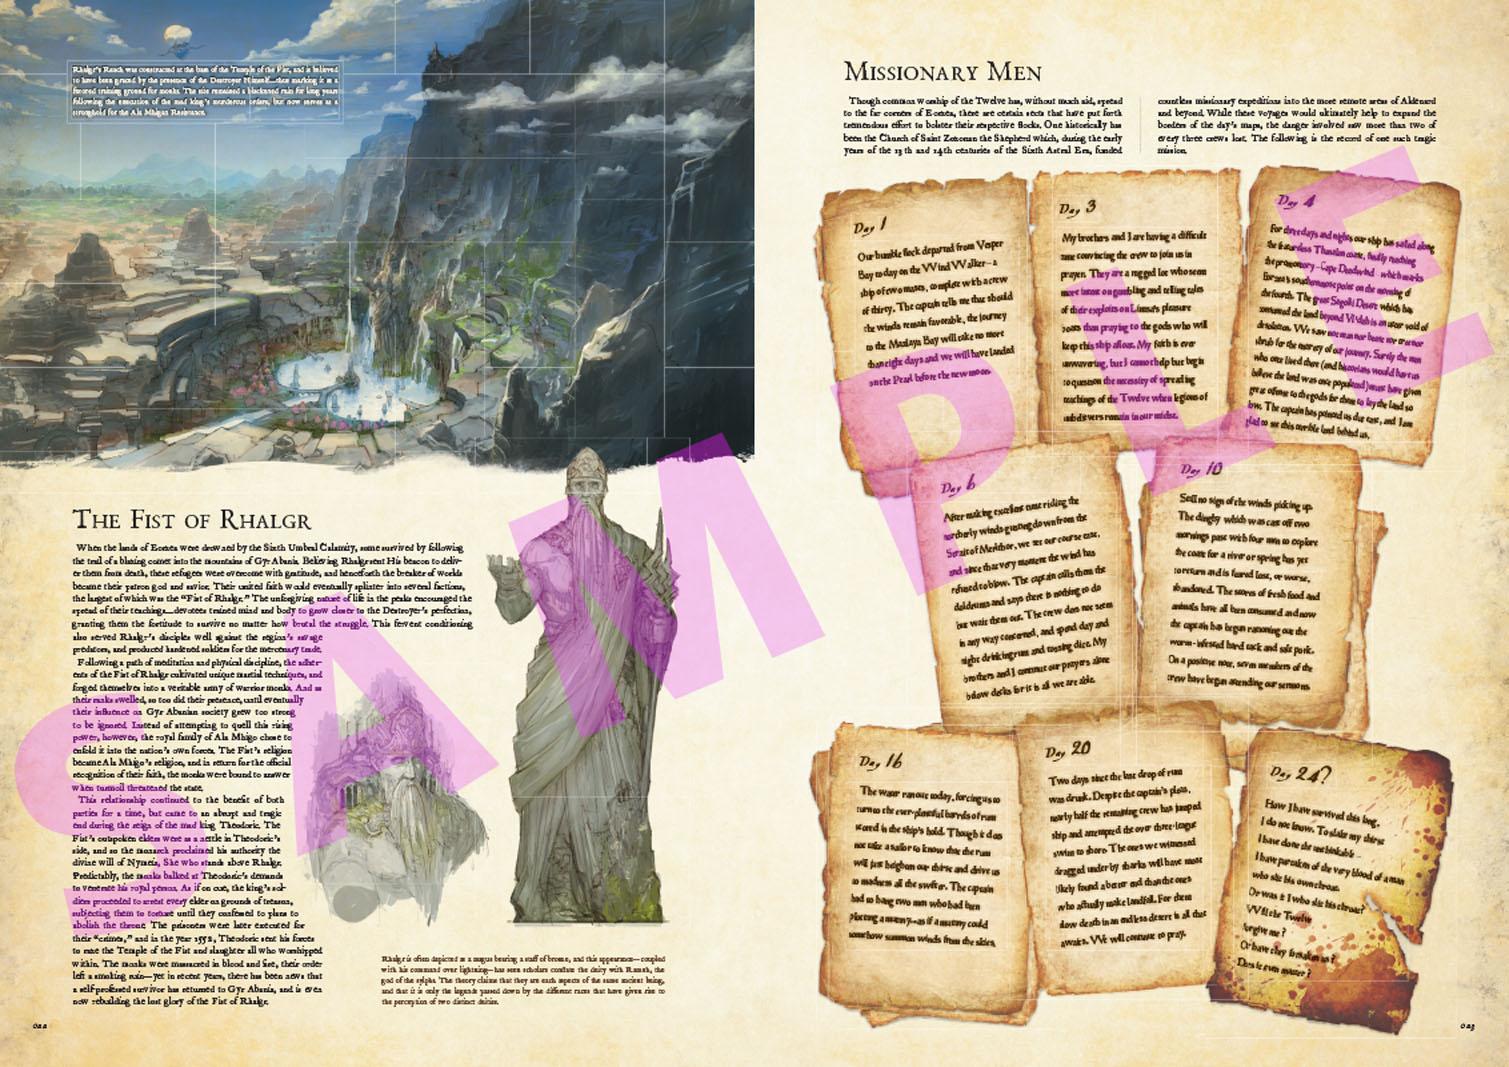 ENCYCLOPAEDIA EORZEA: THE WORLD OF FINAL FANTASY XIV [VOLUME 2]